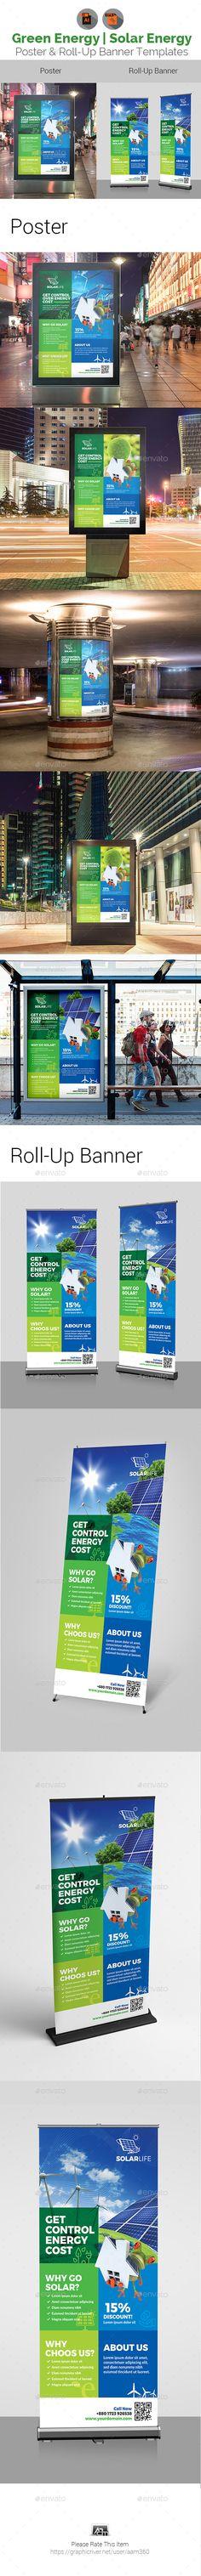 Solar Energy Poster & Roll-Up Banner - Signage Print Templates Portfolio Website Design, Portfolio Layout, Rollup Banner, Illustrator Cs5, Background Templates, Banner Template, Print Templates, Solar Energy, Banner Design